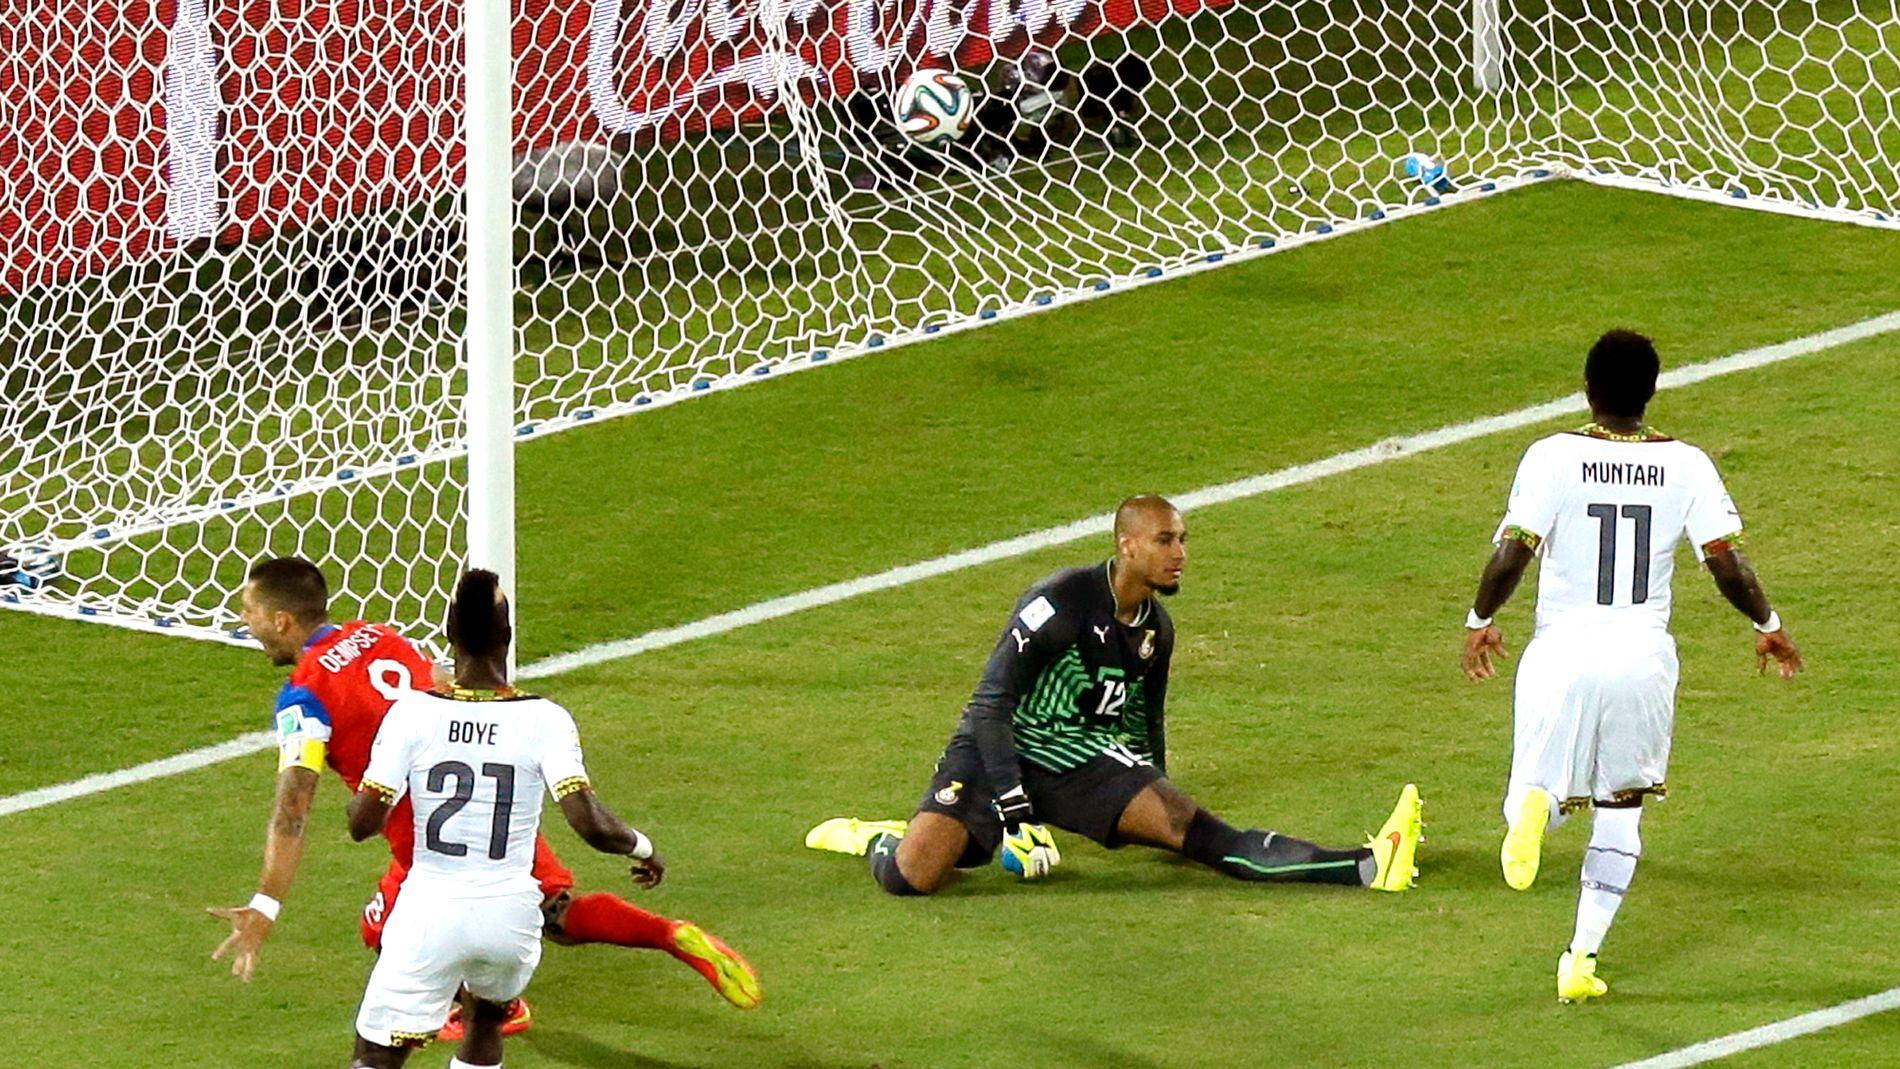 I VM 2014: USAs Clint Dempsey har nettopp satt ballen i mål bak Ghana-keeper Adam Larsen Kwarasey.